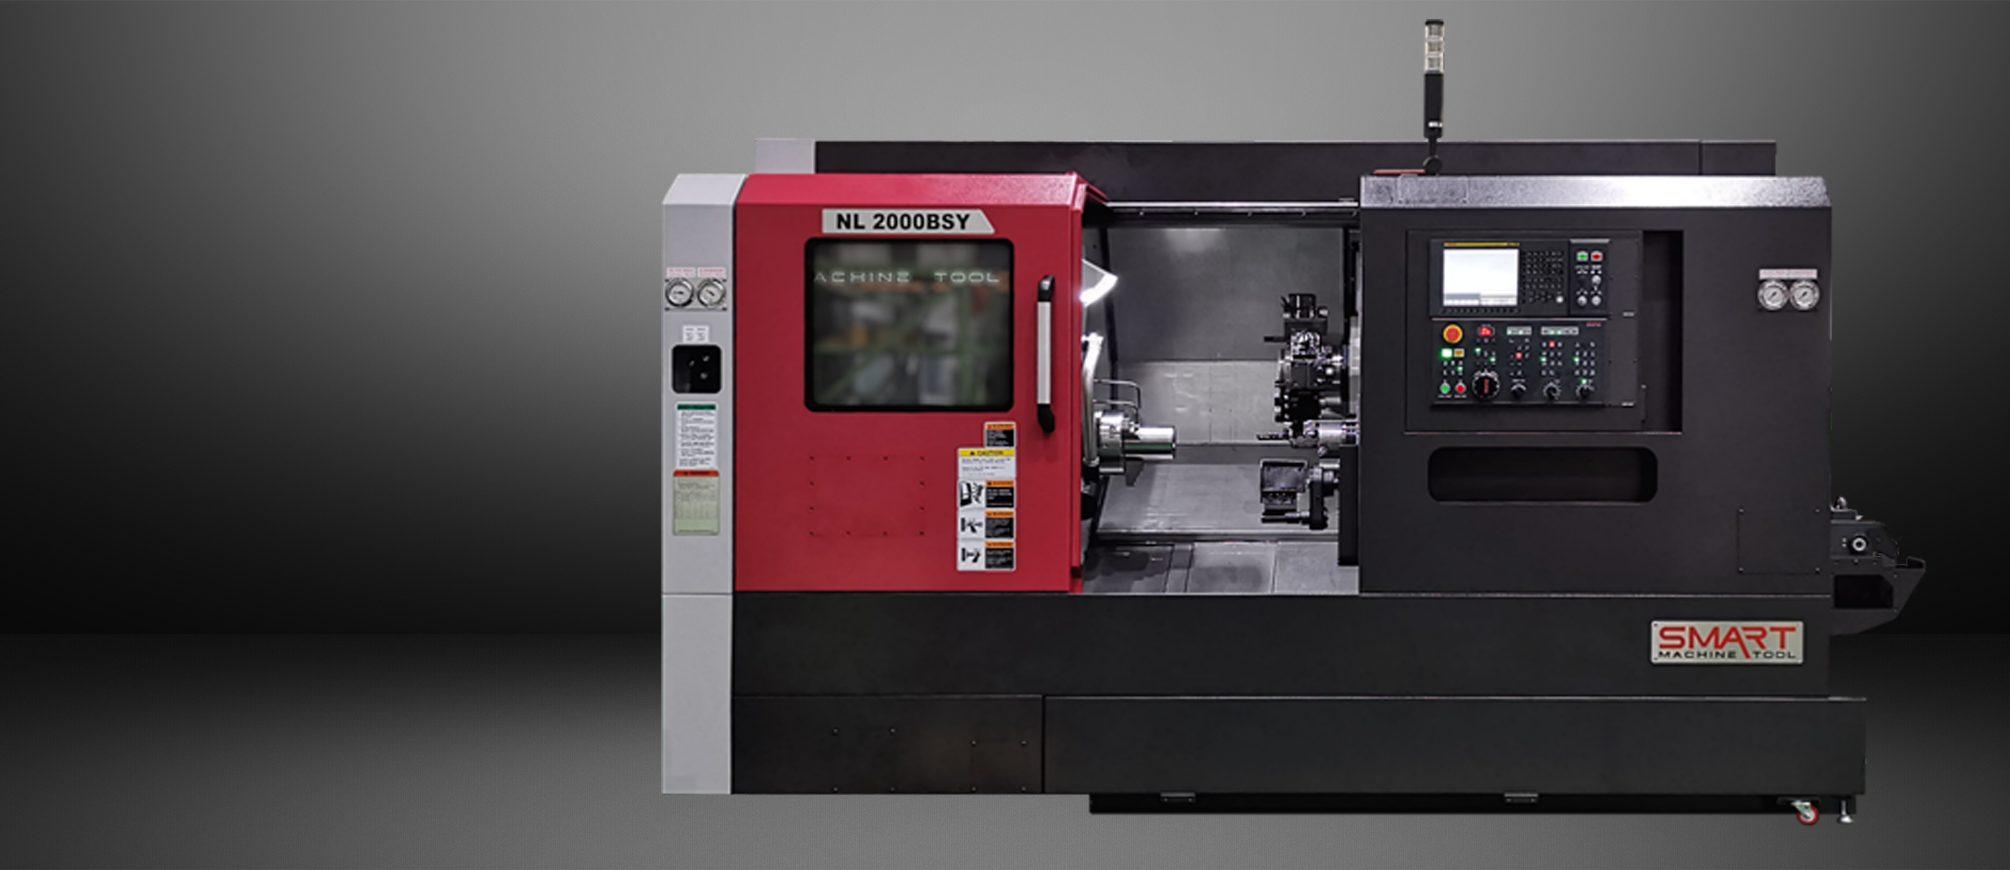 SMART NL 2000BSY – BOX WAY – (8″ CHUCK) Multi-Axis CNC Lathes